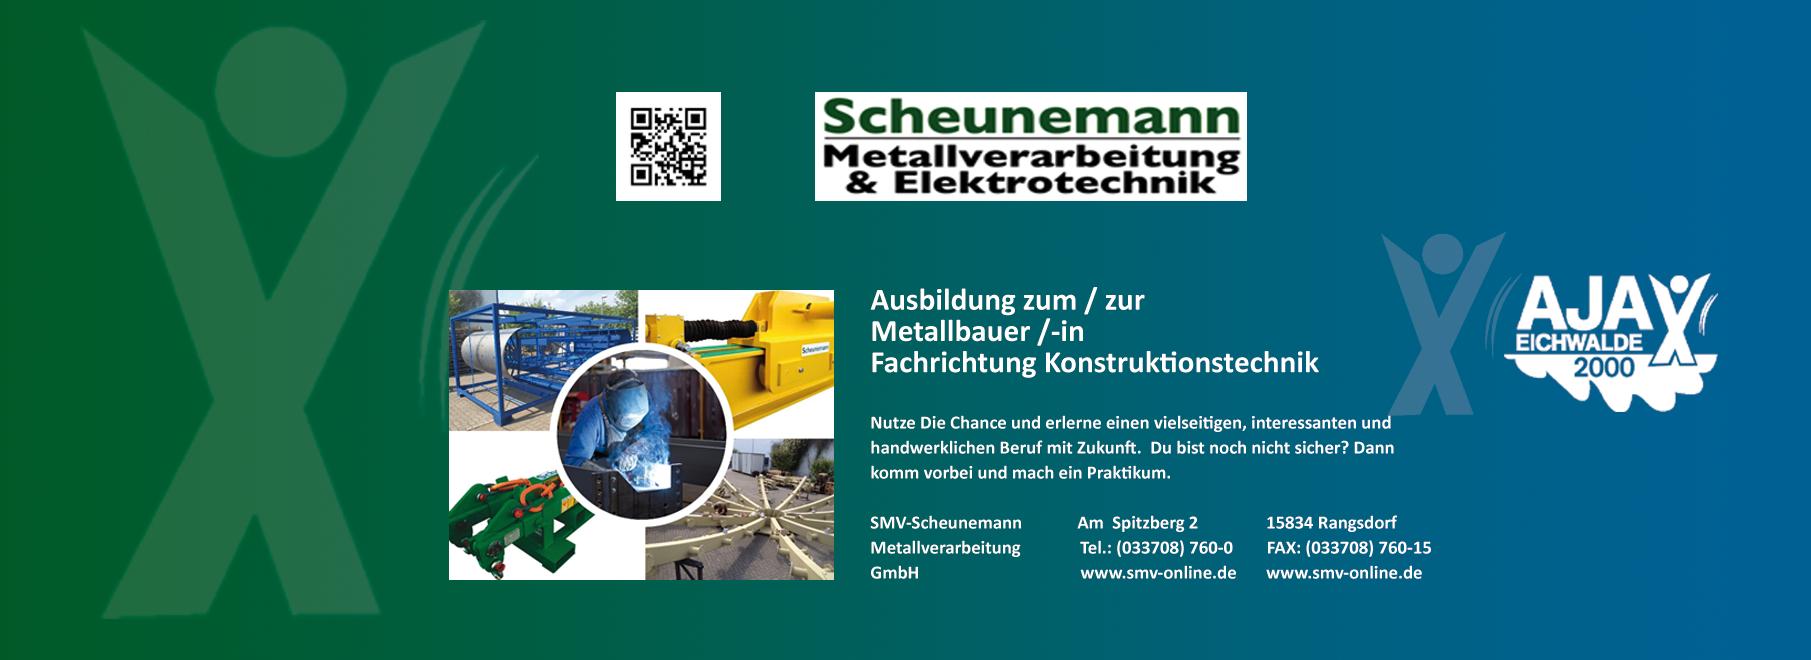 Scheunemann